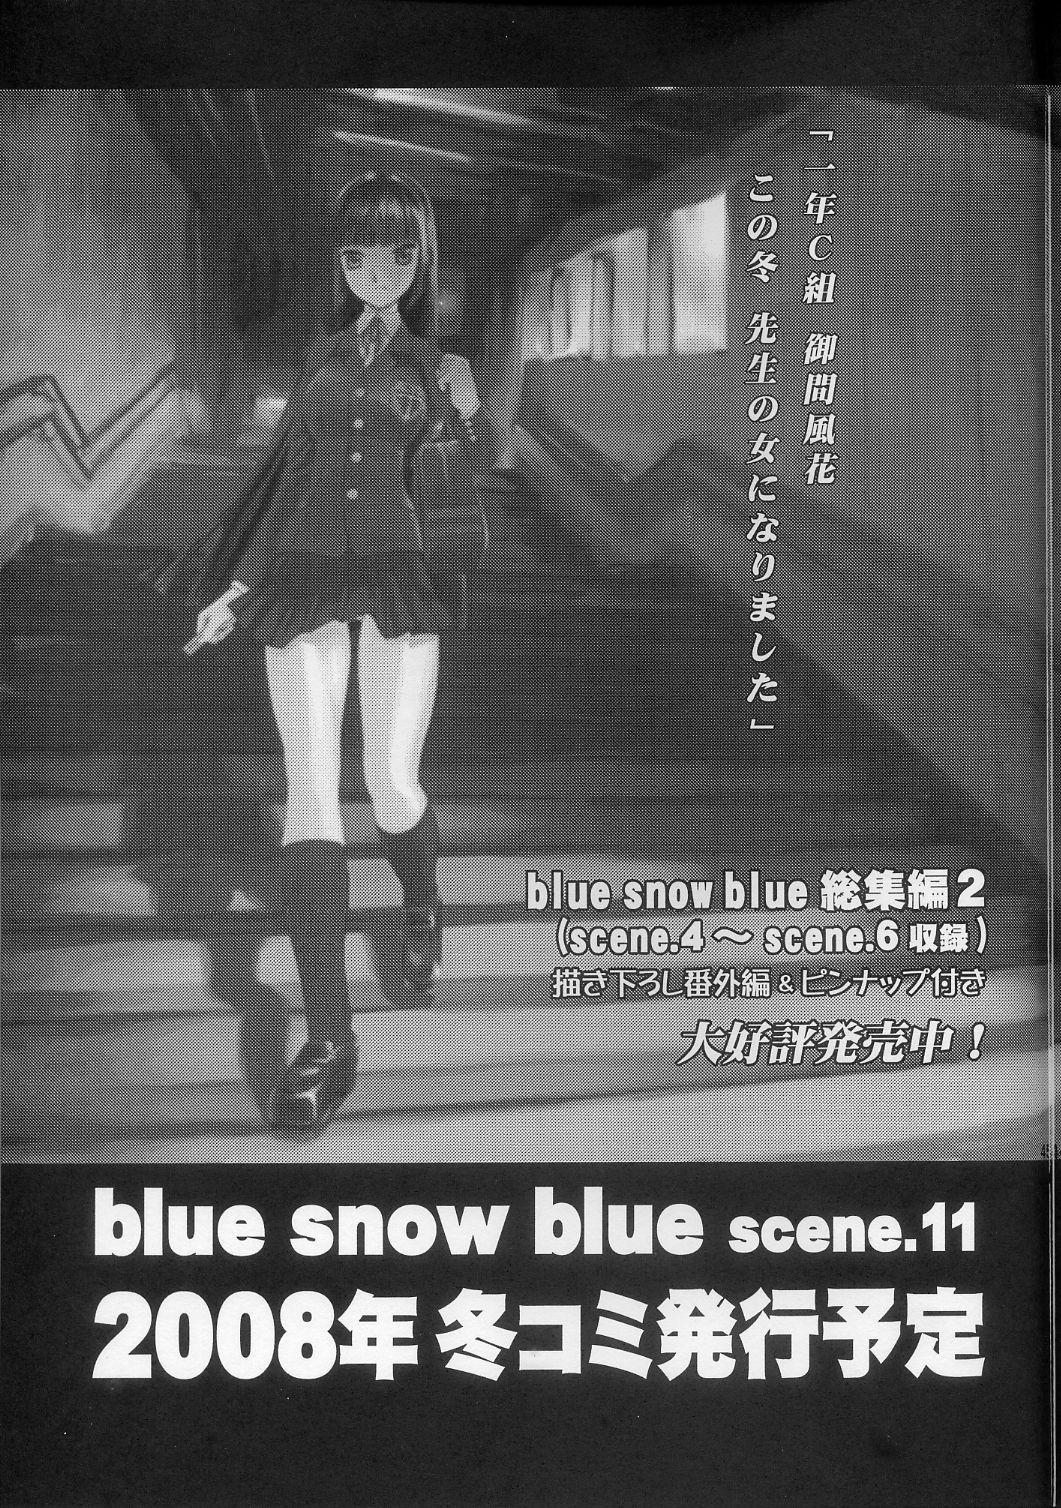 blue snow blue scene.10 43